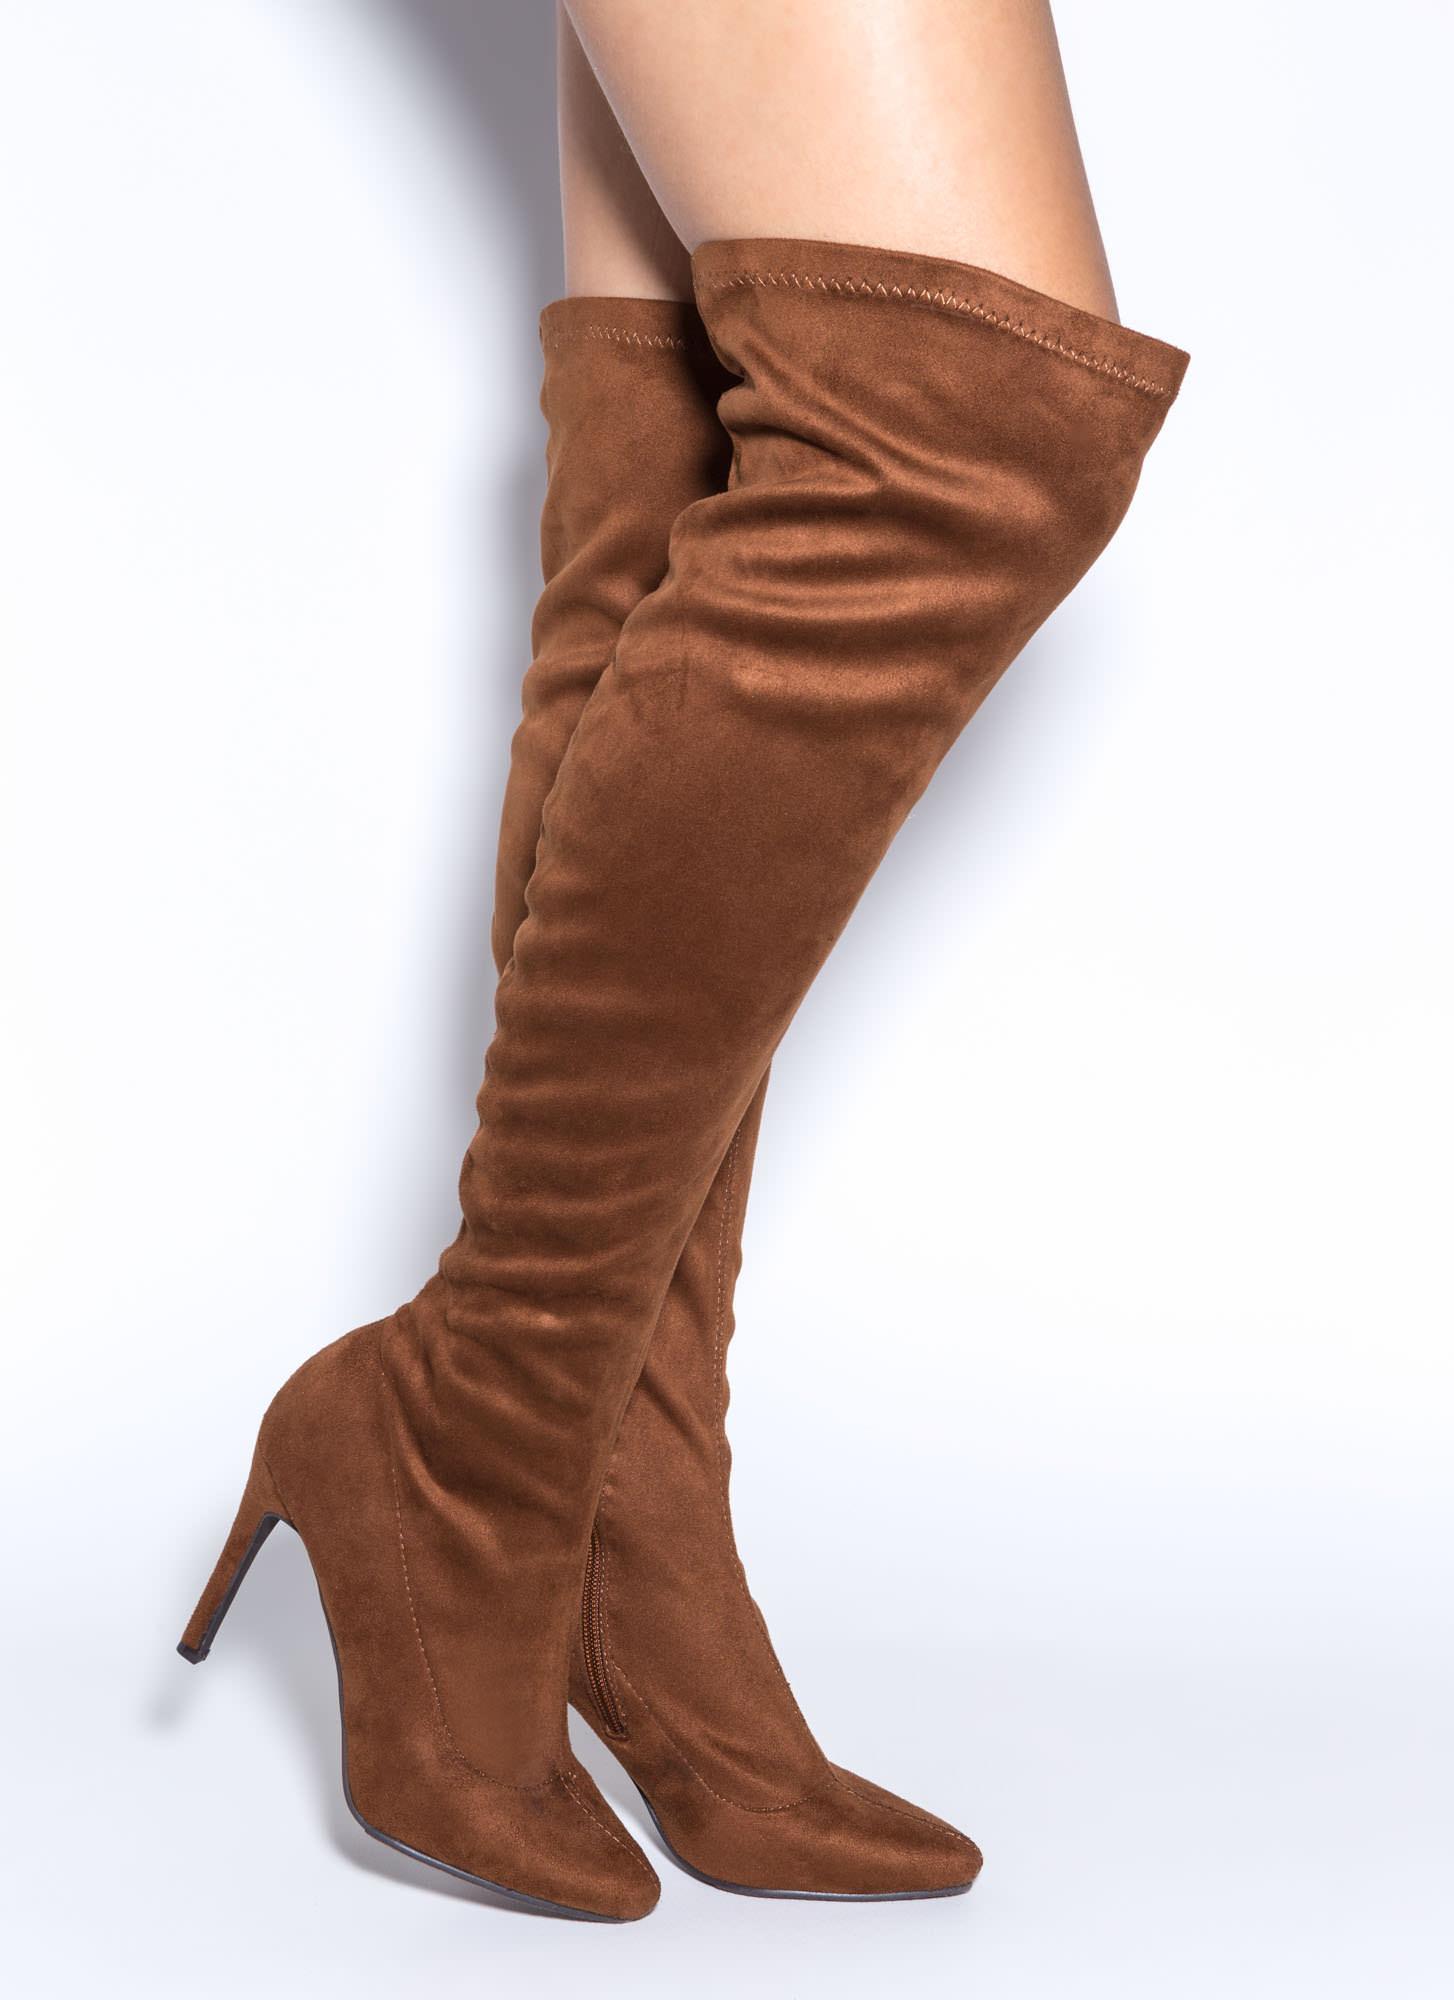 Trip Over-The-Knee Boots BLACK TAN - GoJane.com